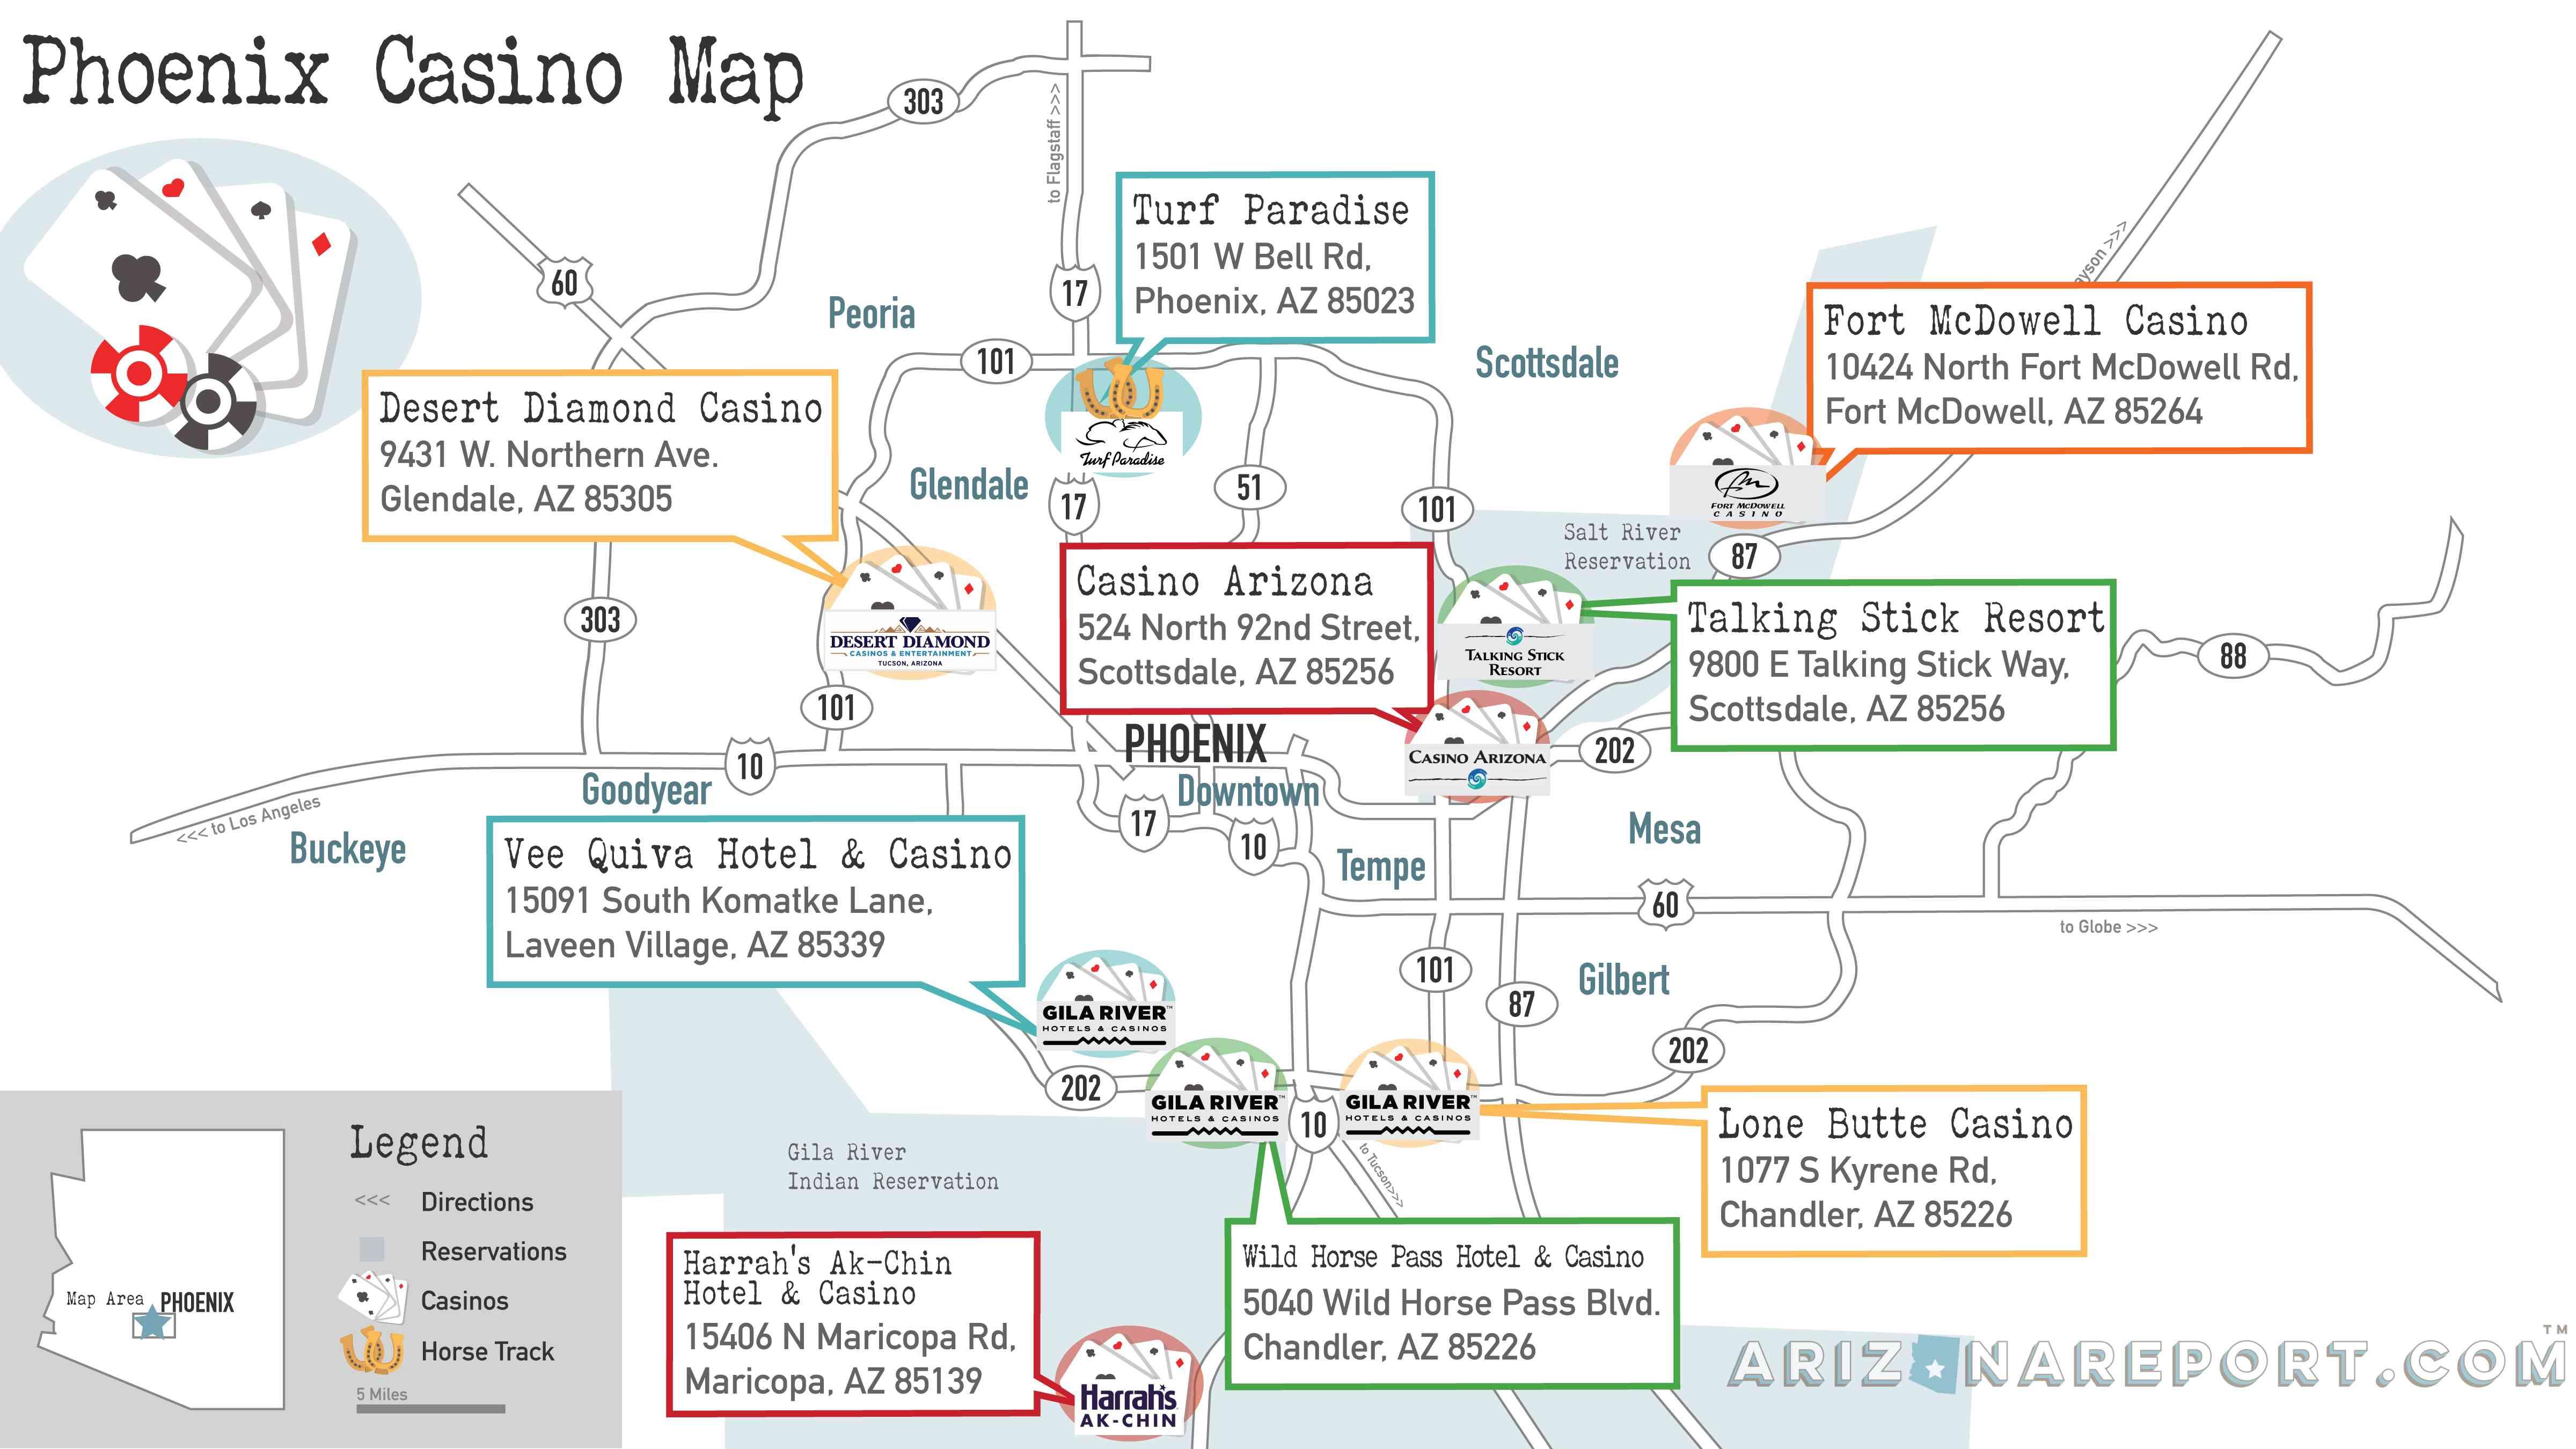 Phoenix casino map of the 8 tribal casinos and 1 horse racing track in metro Phoenix, Arizona.